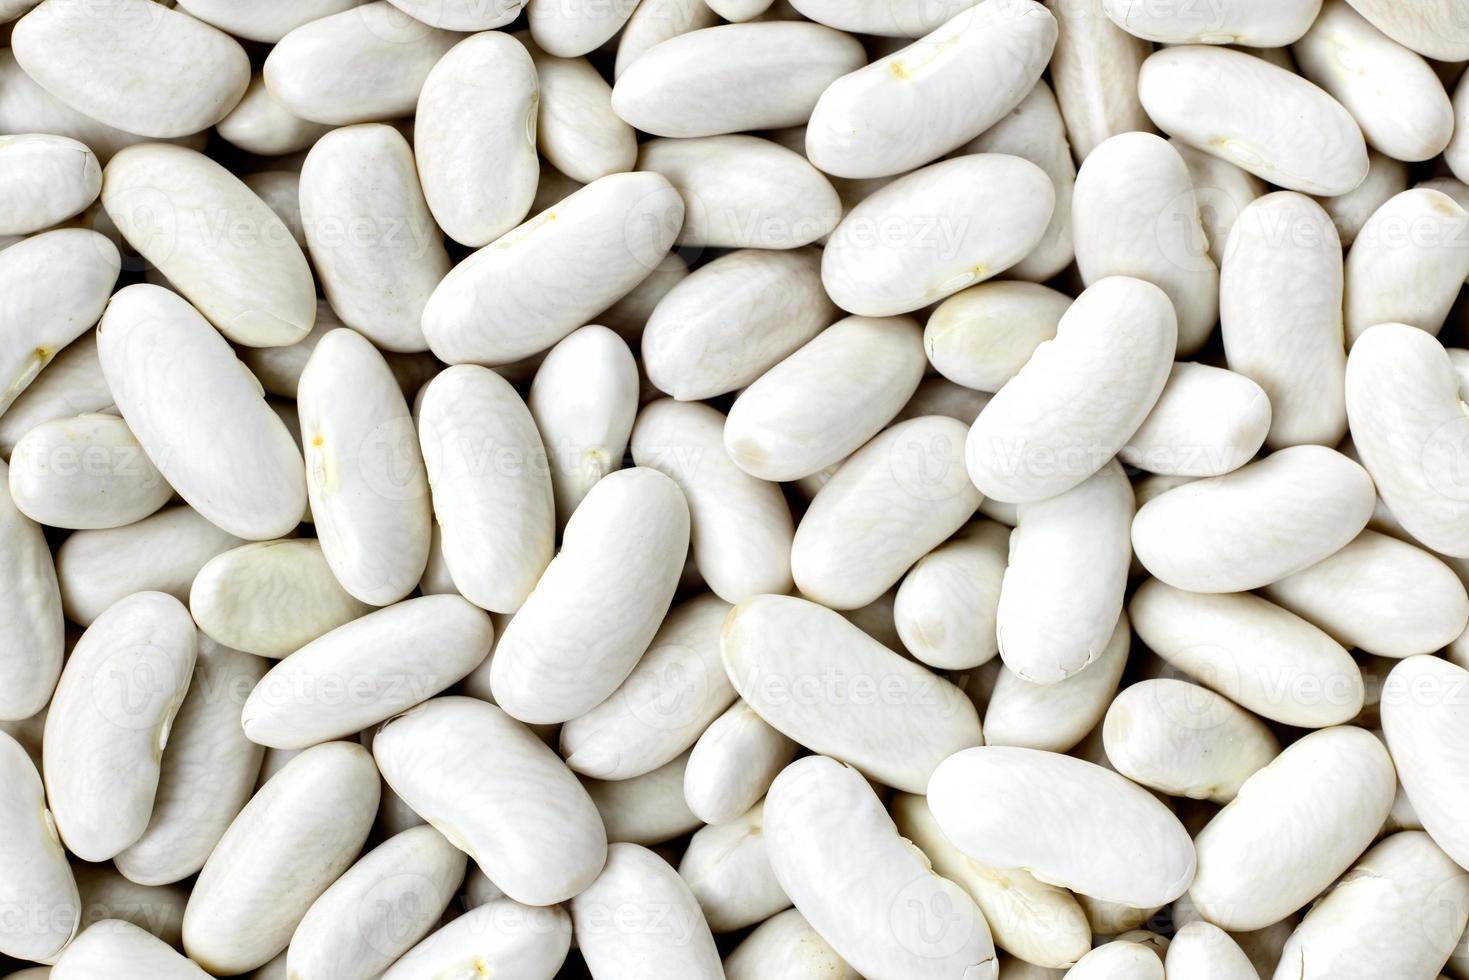 marin, haricot, vit ärta, vit njure eller cannellini bönor textu foto